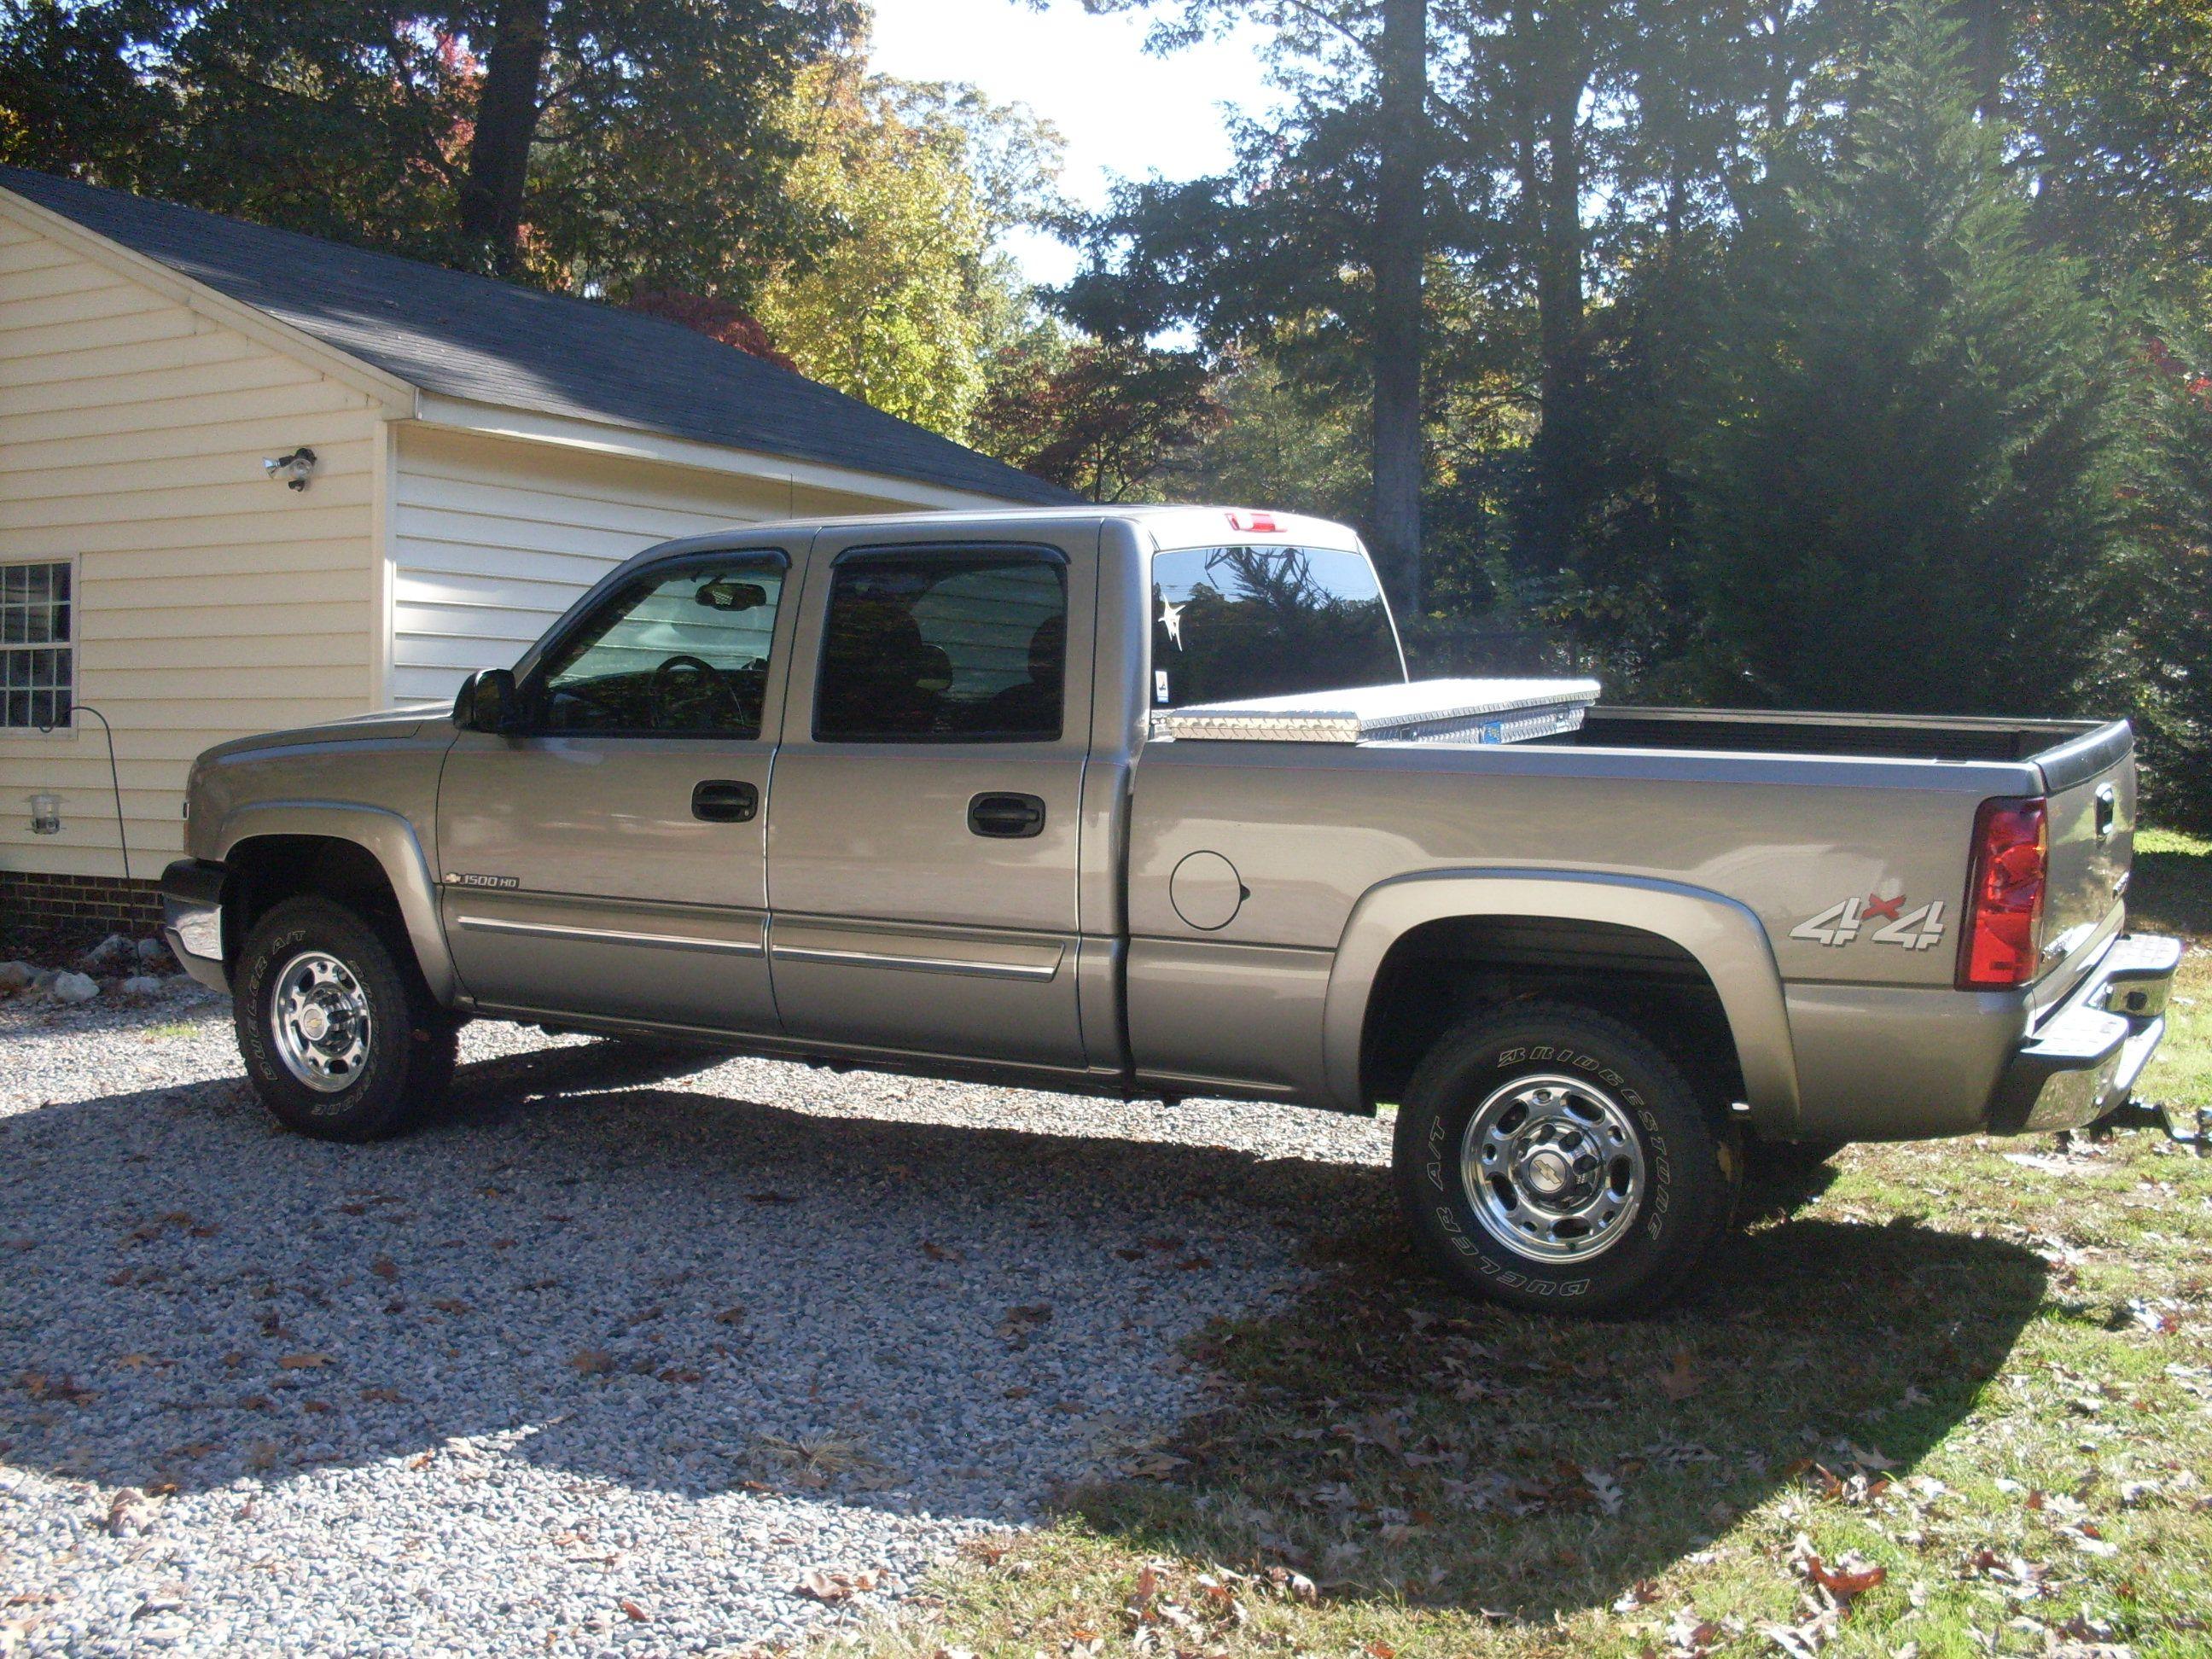 203563d1321493560 2003 chevy silverado 1500 hd pickup truck sdc10204 rh pinterest com